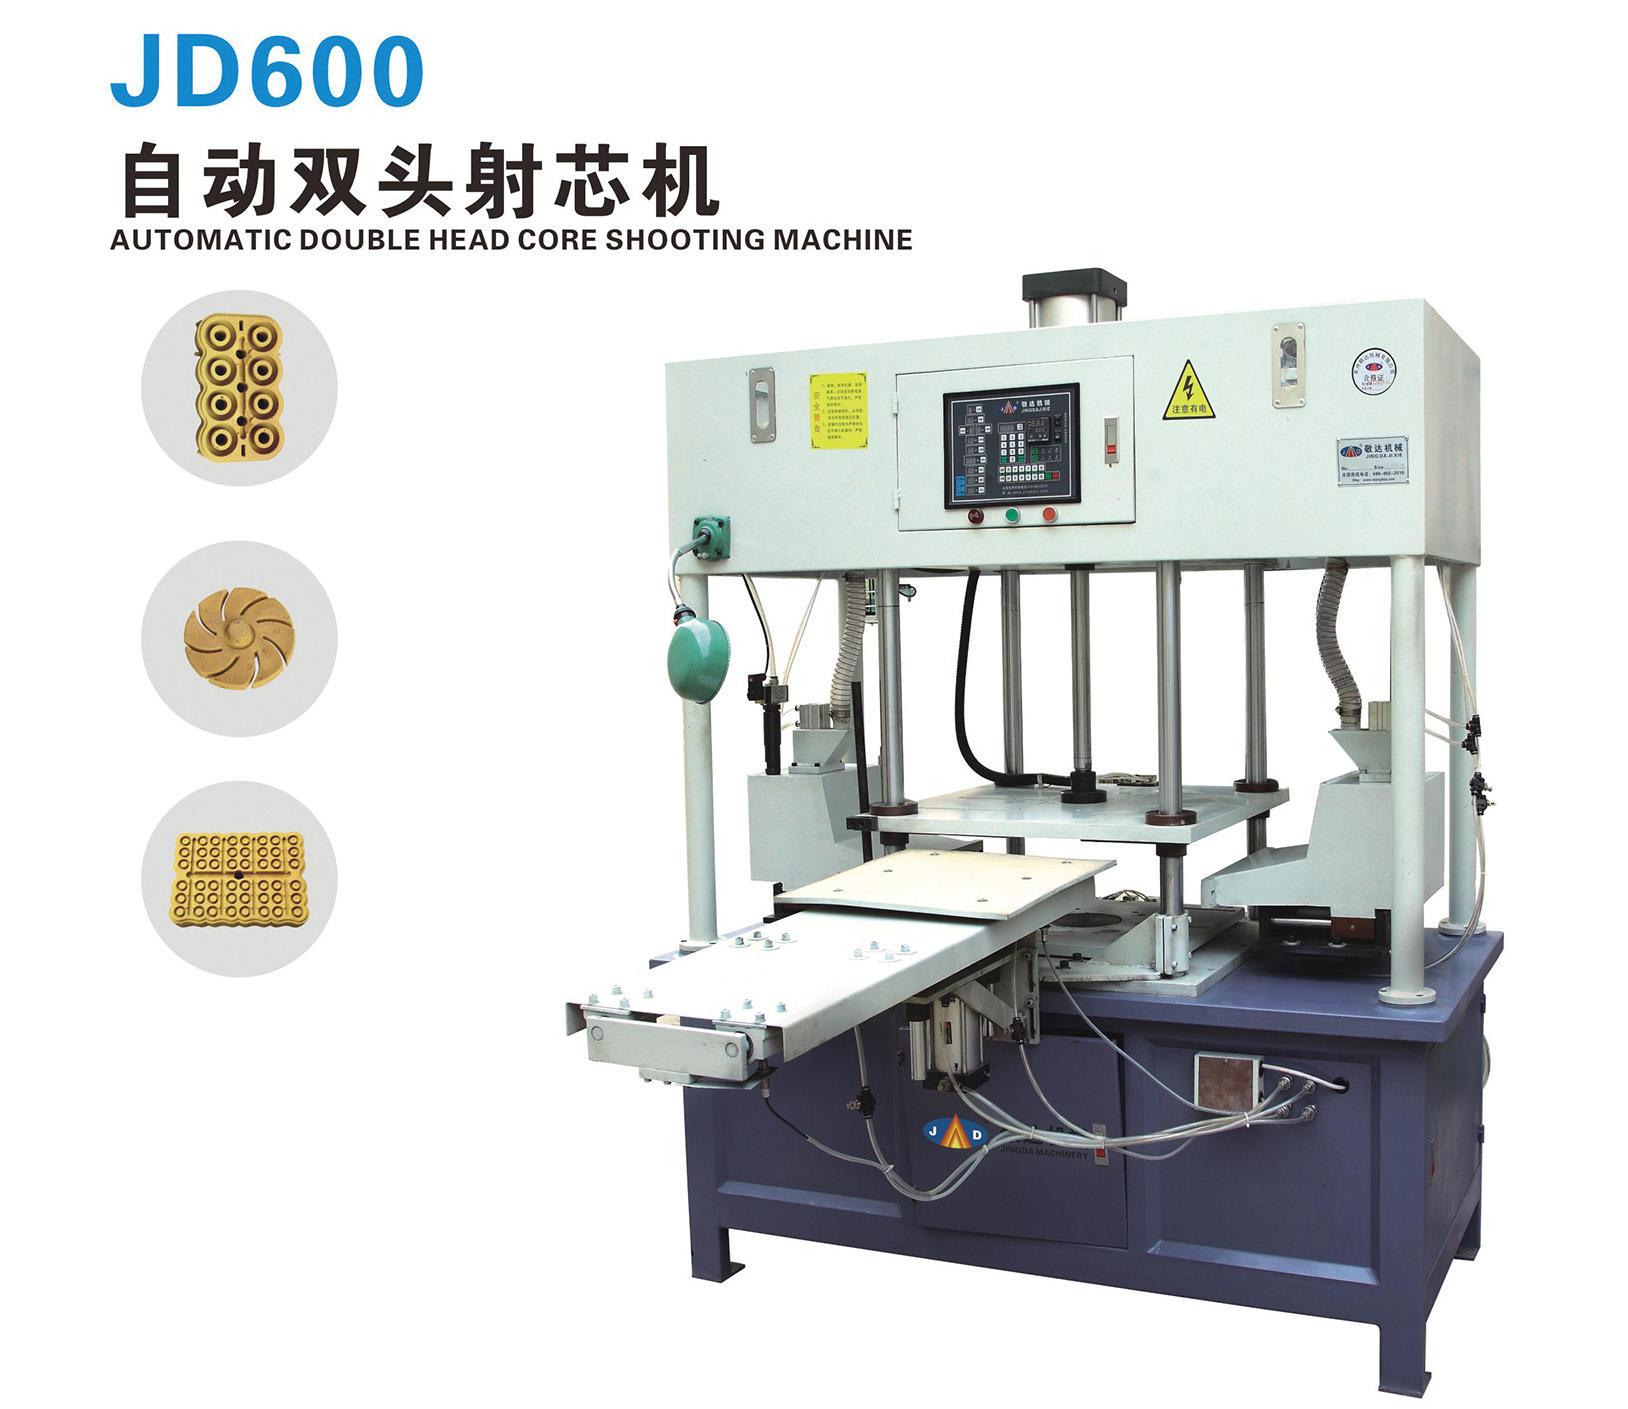 JD-600